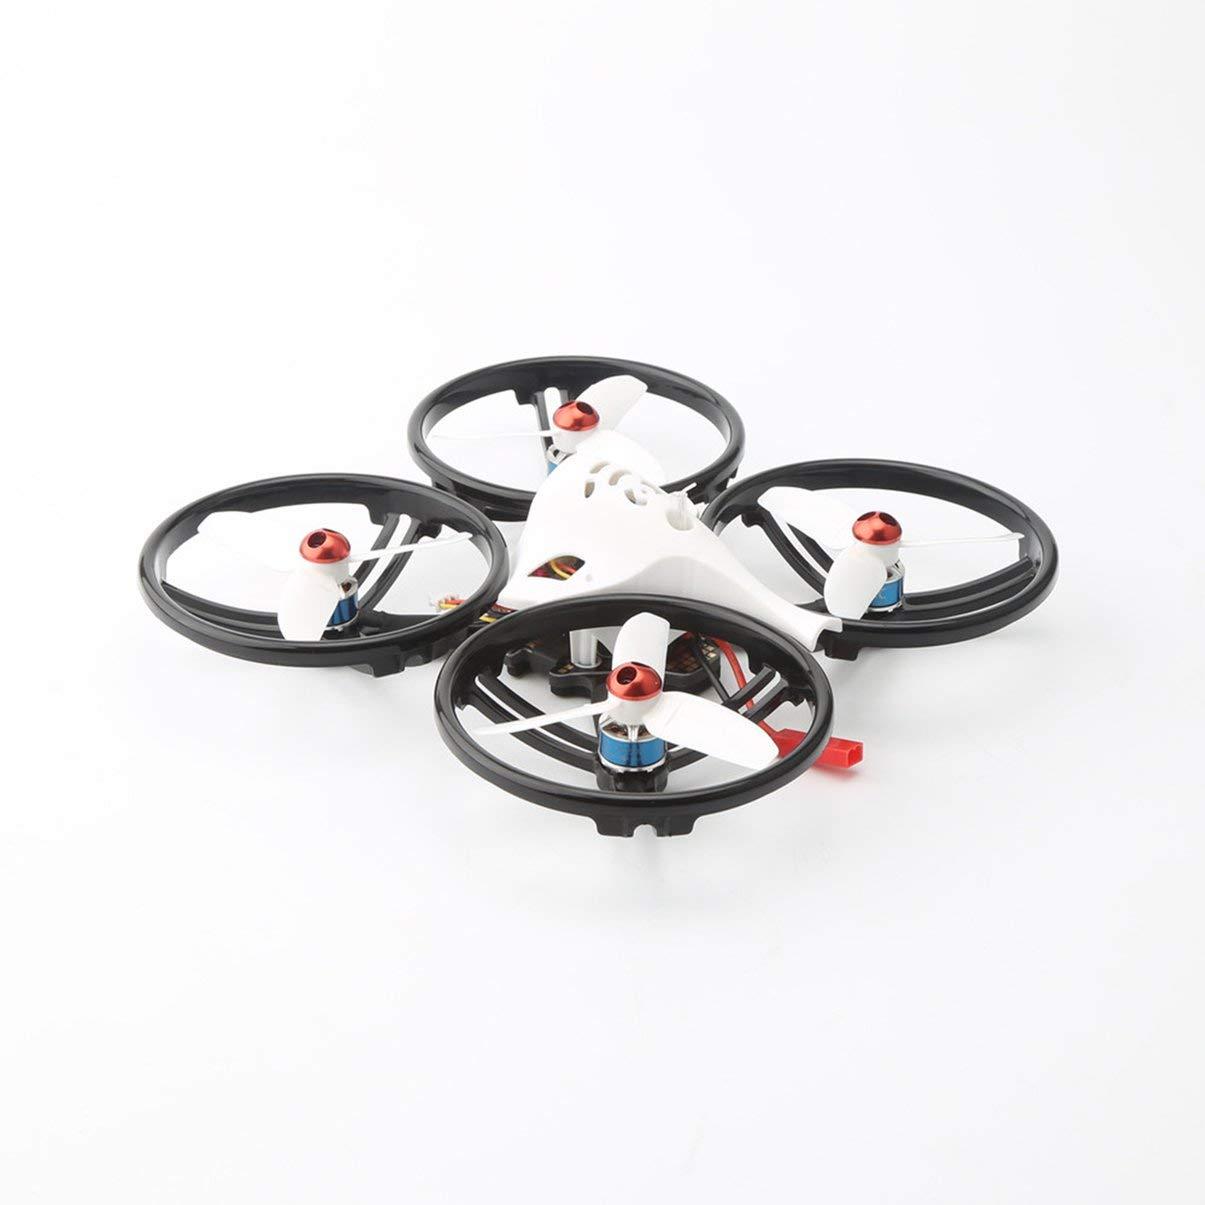 JullyeleITgant JullyeleITgant JullyeleITgant LDARC ET125 V2 5.8G Micro Mini Brushless FPV RC Racing Drone Quadcopter con videocamera VTX OSD RX2A PRO Ricevitore PNP Version e5fb07